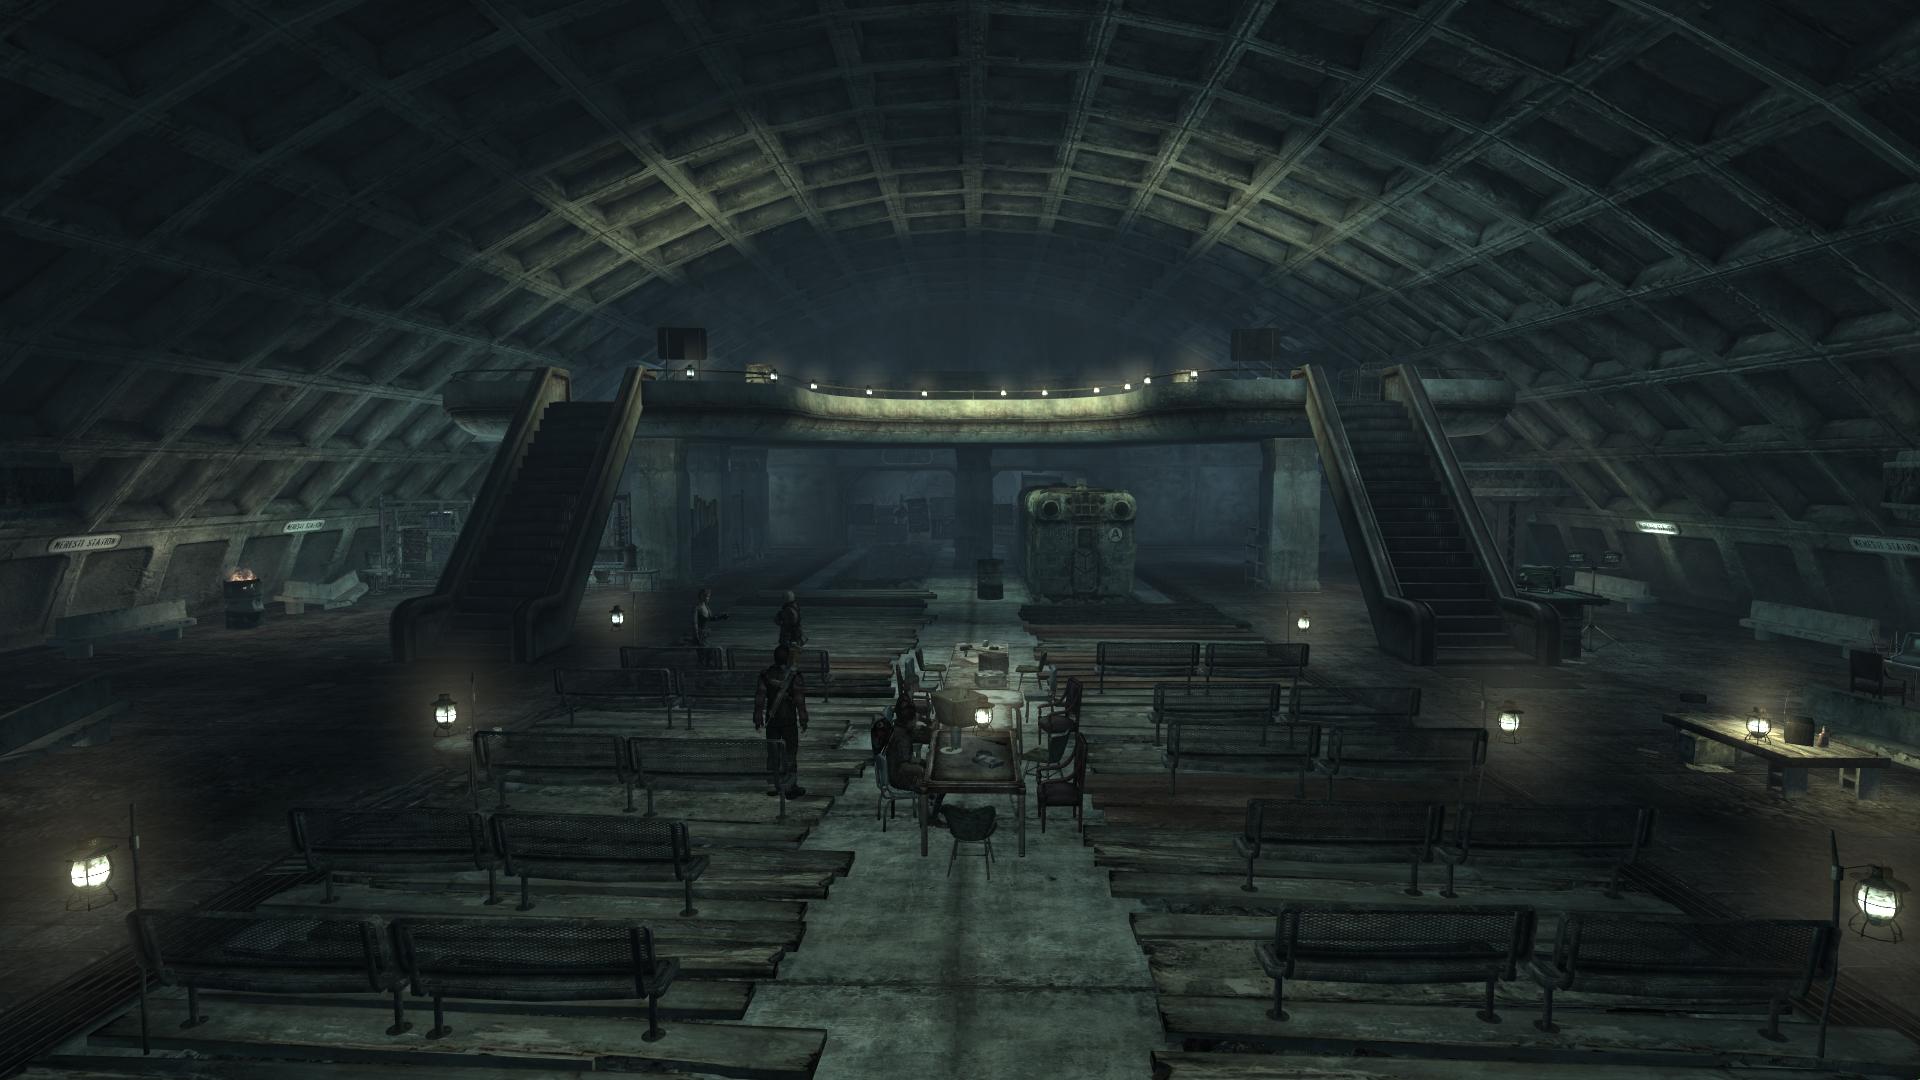 Citaten Seneca Fallout 4 : Ruben cuenta mucho